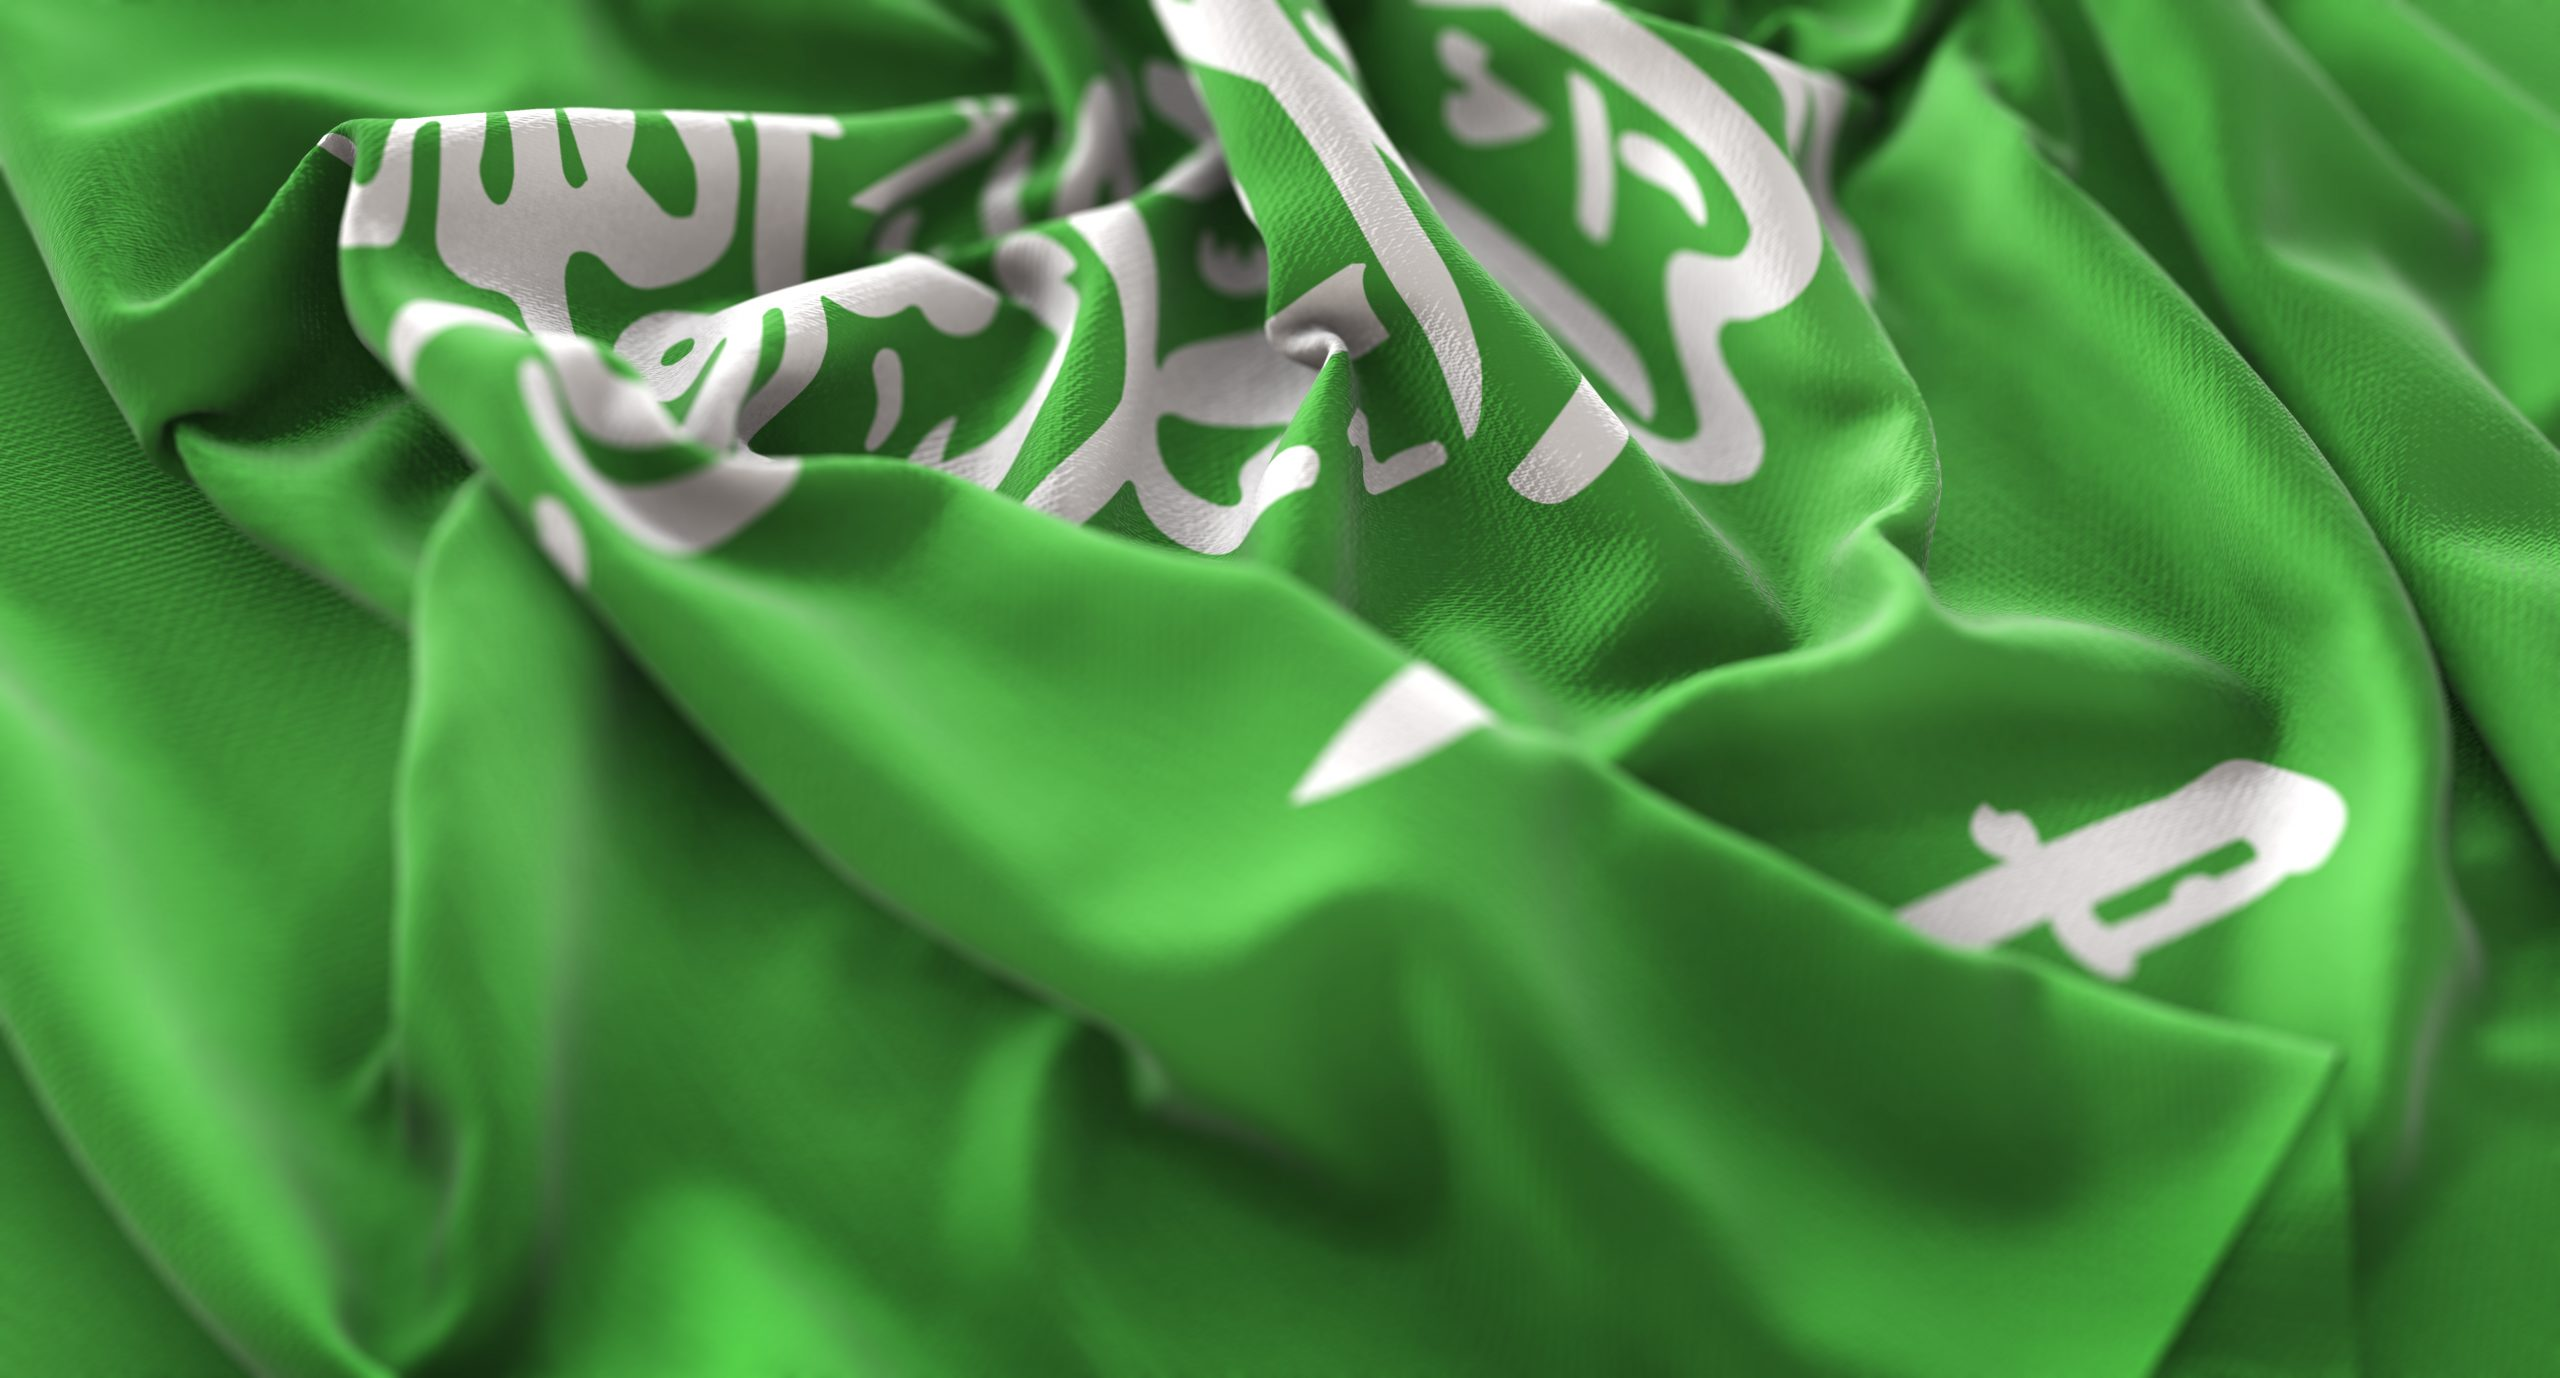 saudi arabia flag ruffled beautifully waving macro close up shot scaled 1 - Home